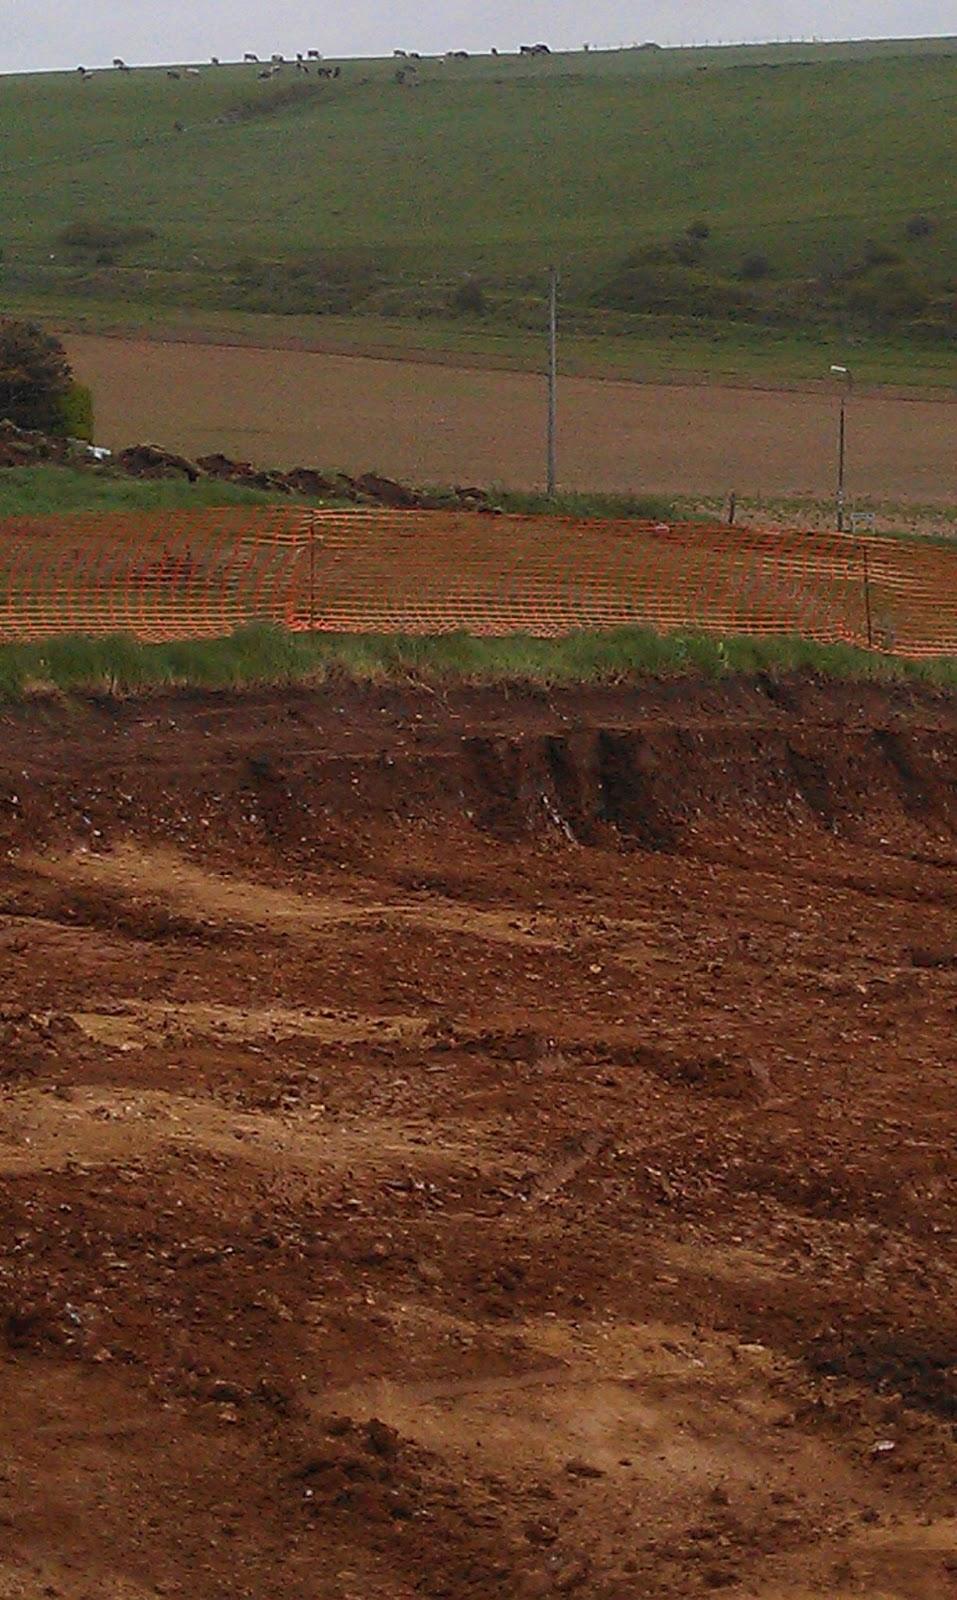 Major Soil Types of India: Alluvial Soils & Black Soils